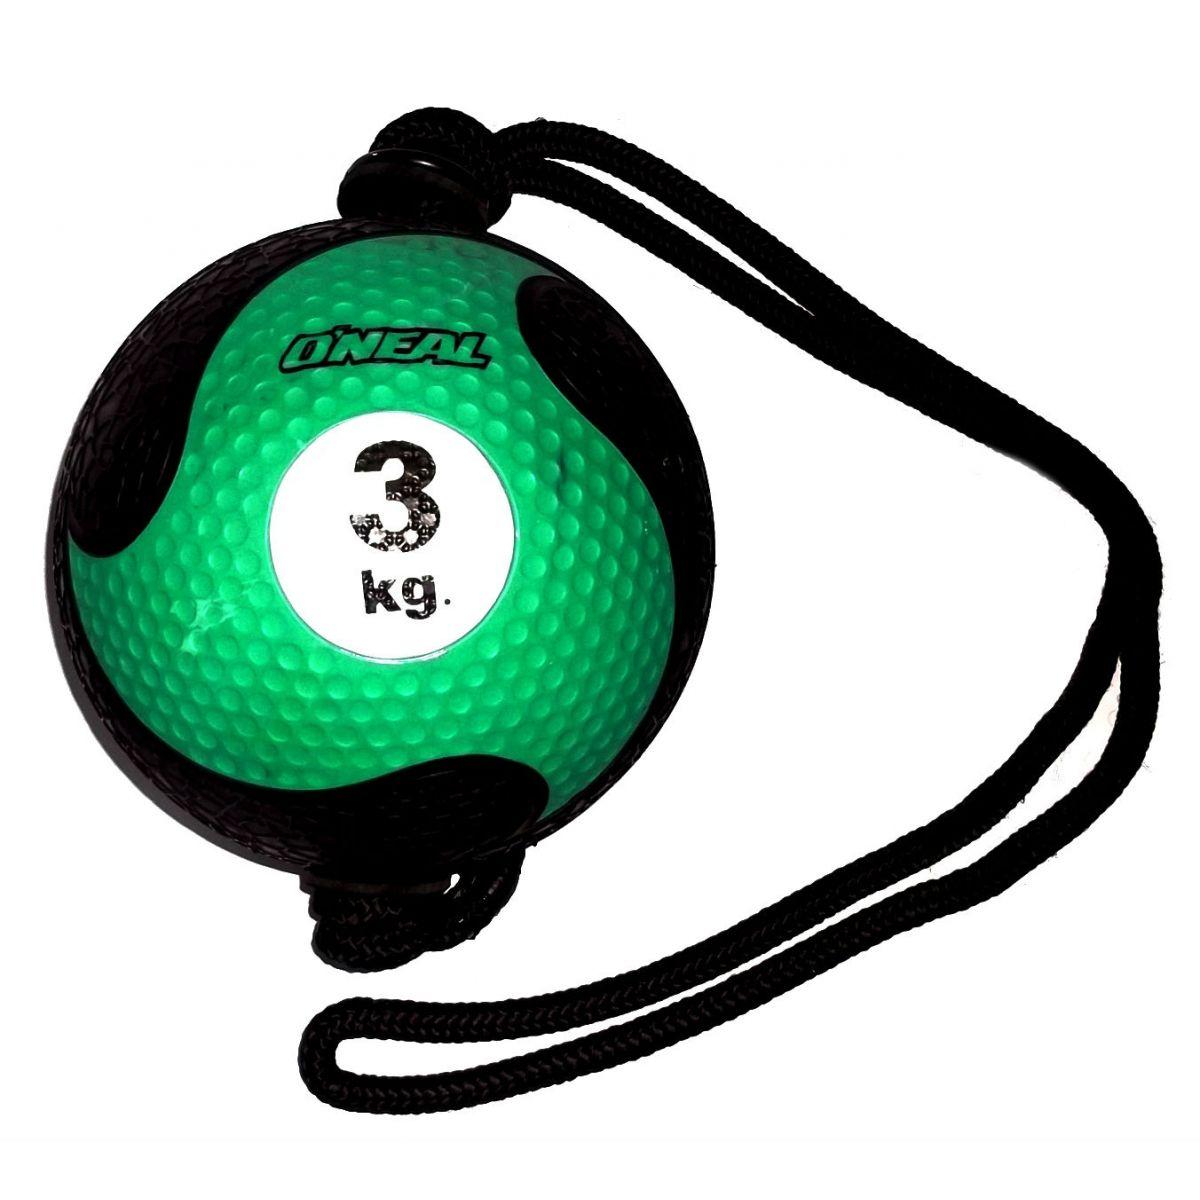 Medicine ball corda 3kg borracha verde unisex yoga oneal